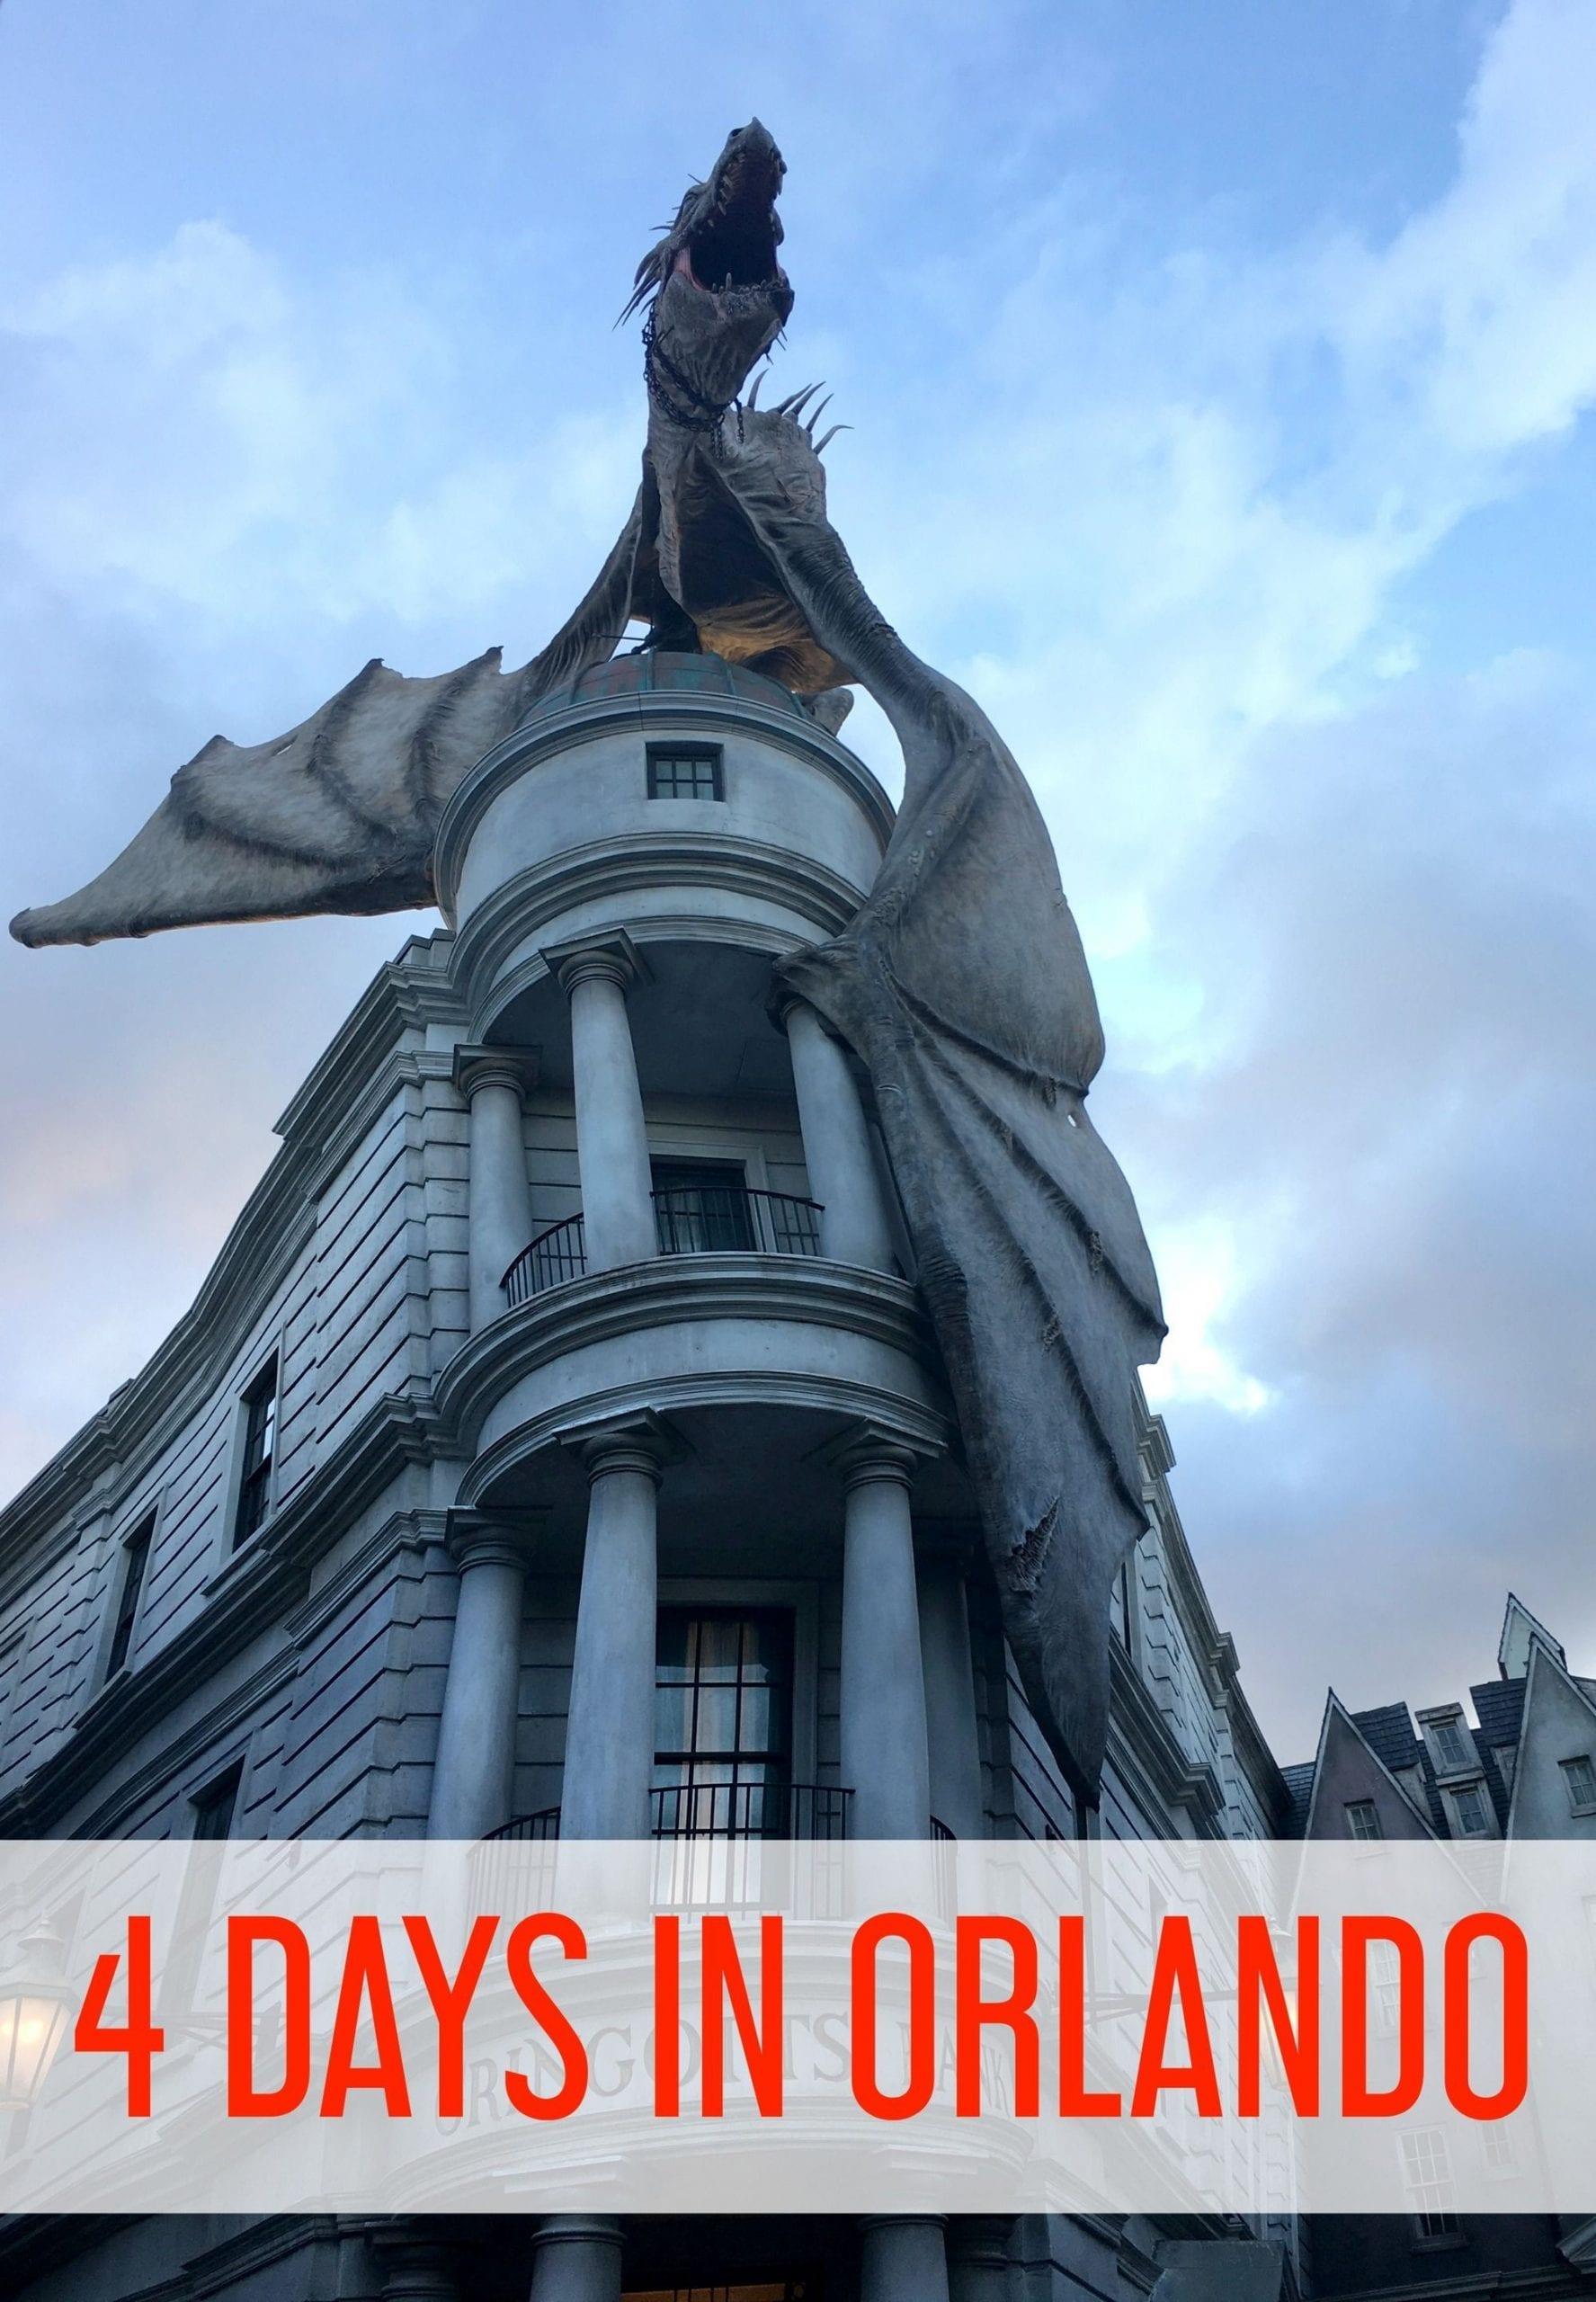 Four days in Orlando: Maximizing your Orlando Florida vacation